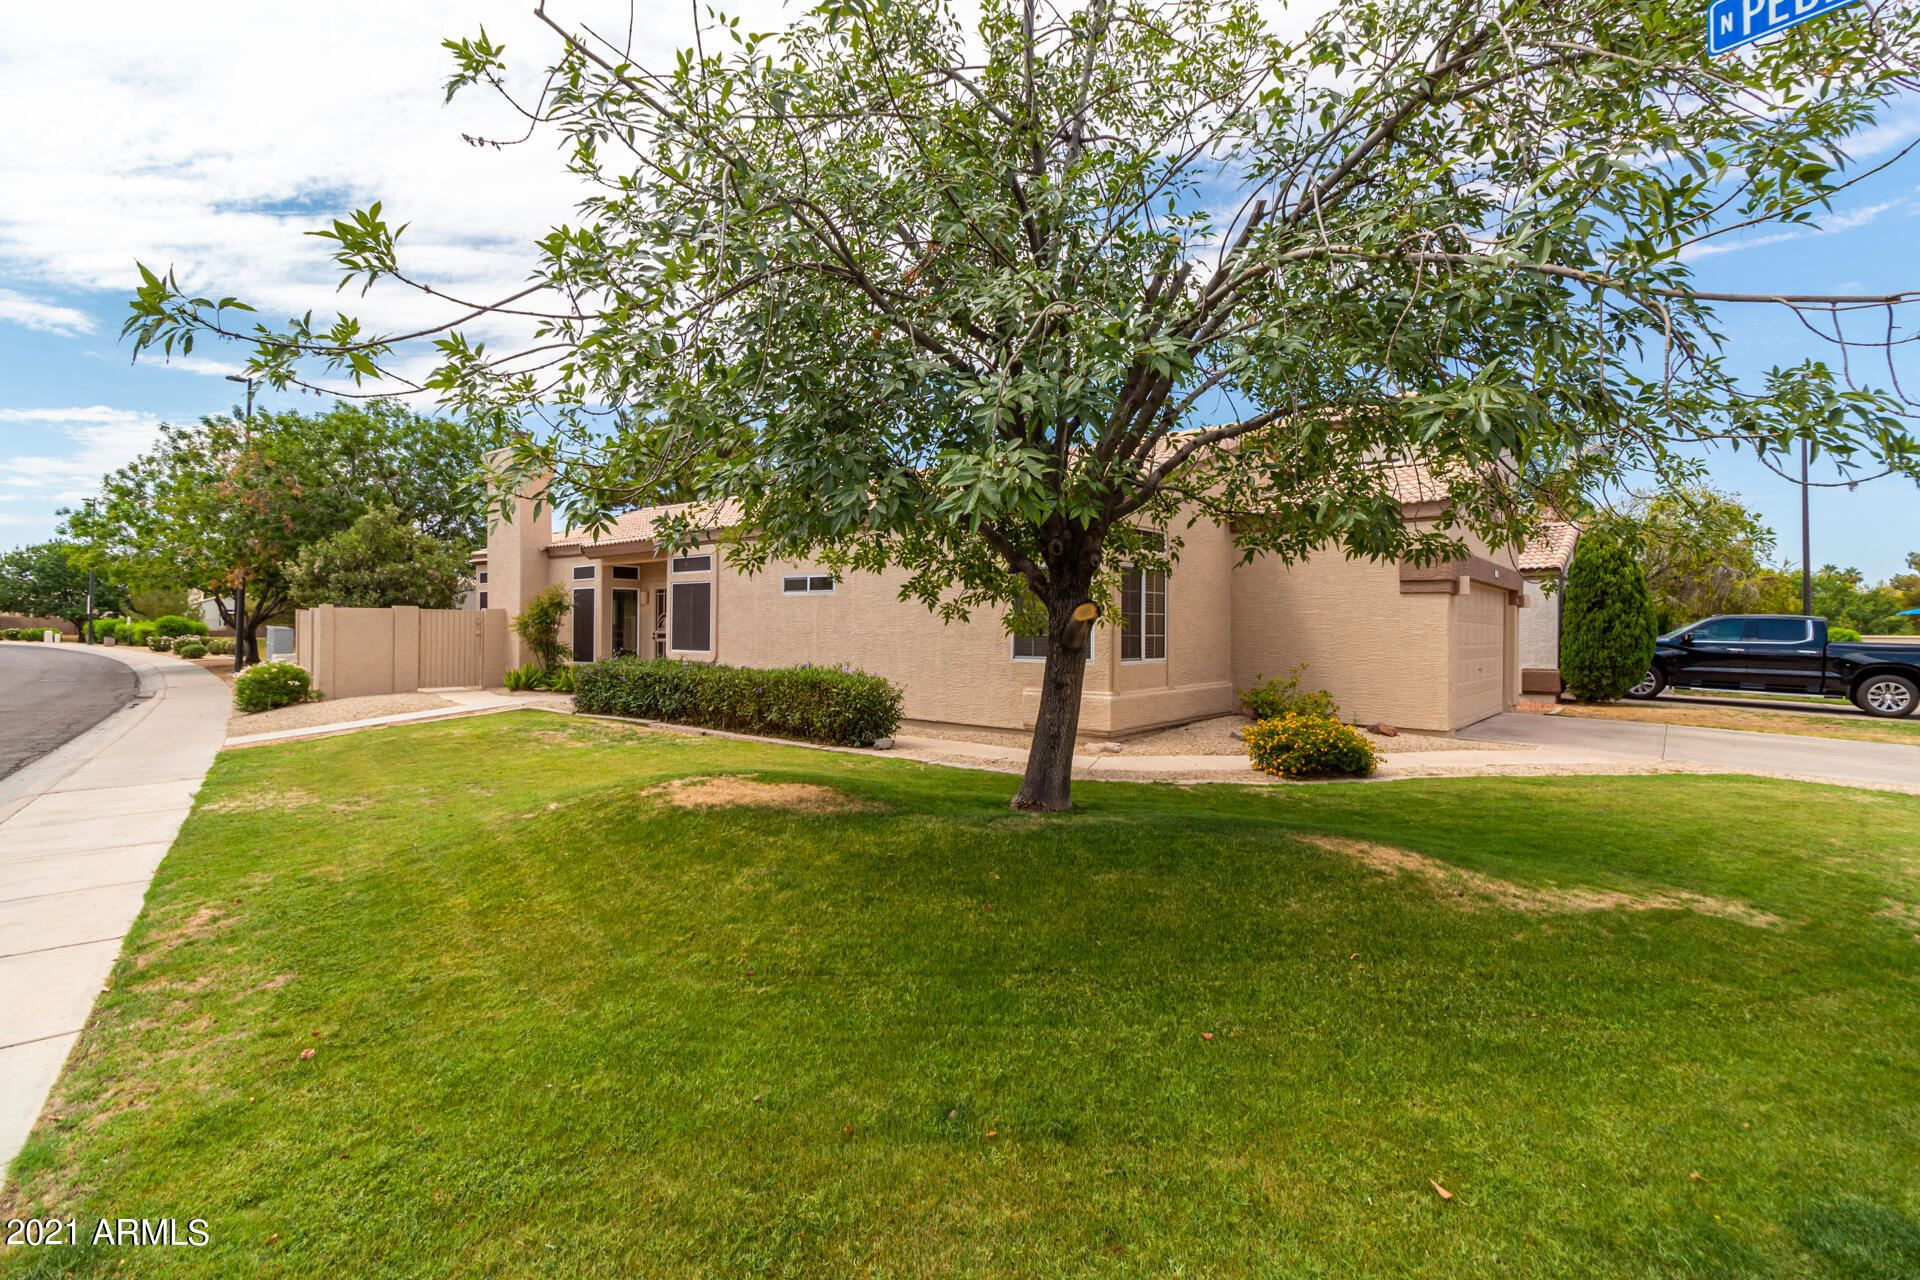 Photo of 1339 E PARKSIDE Drive, Gilbert, AZ 85234 (MLS # 6247403)